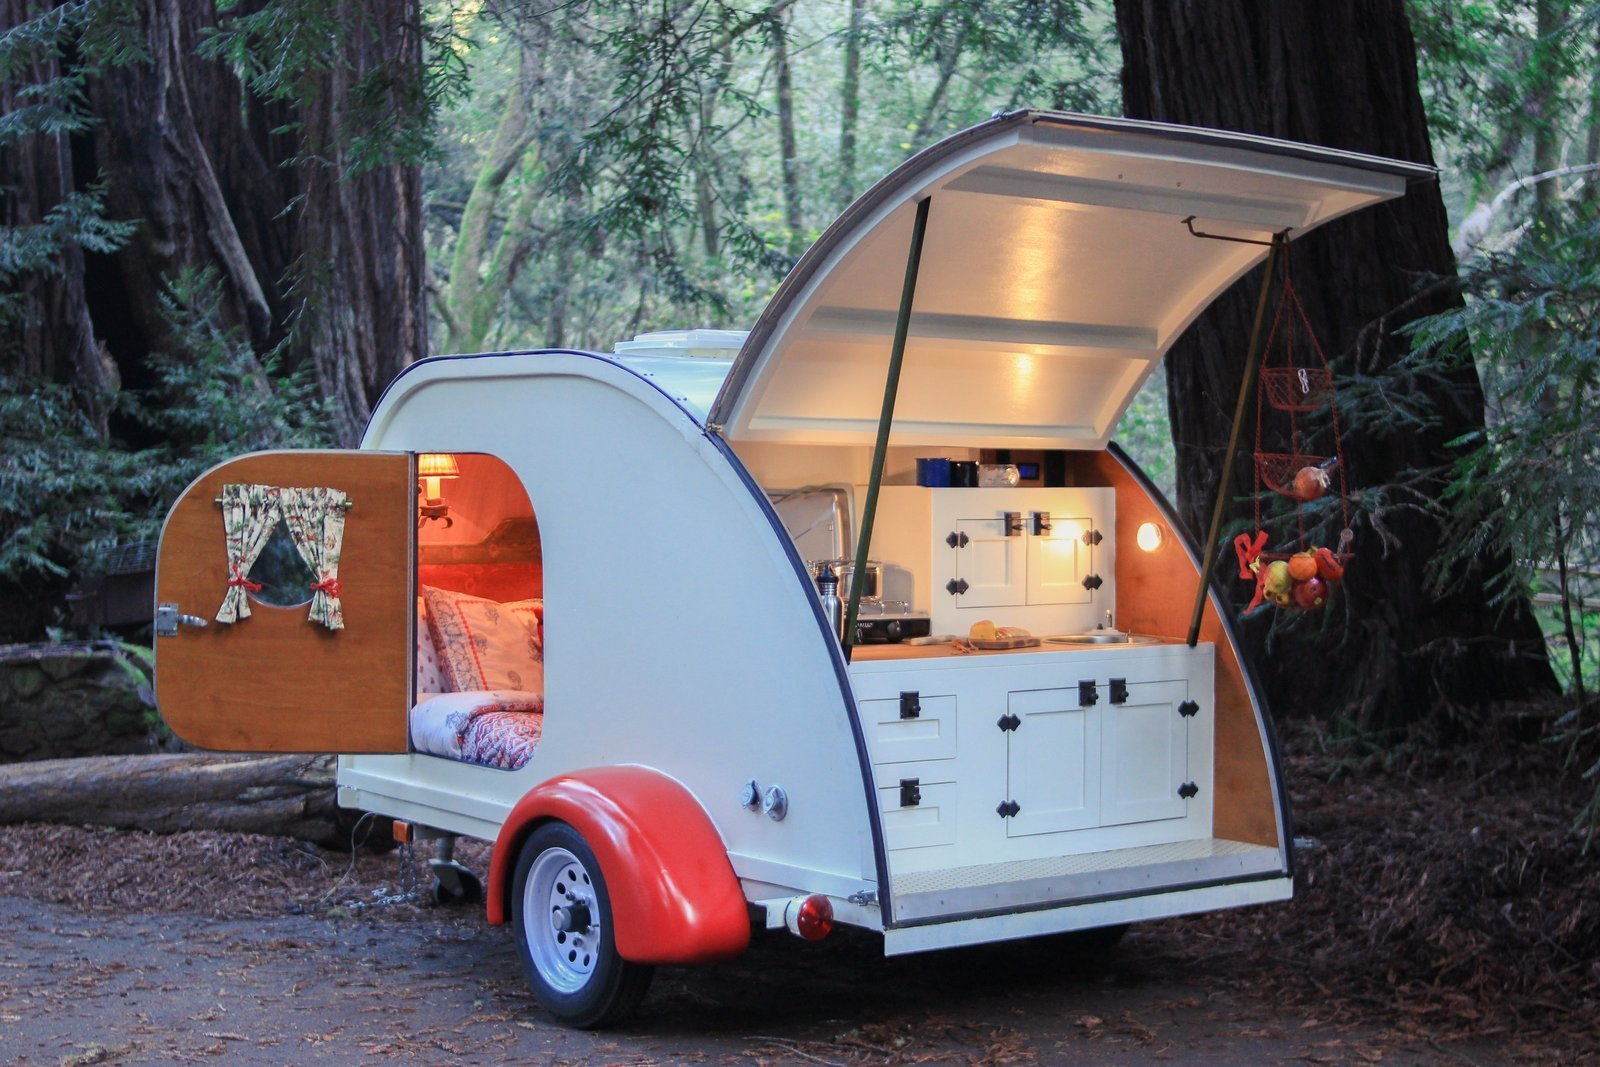 A teardrop trailer from teardrop trailer rental company Camp Weathered.